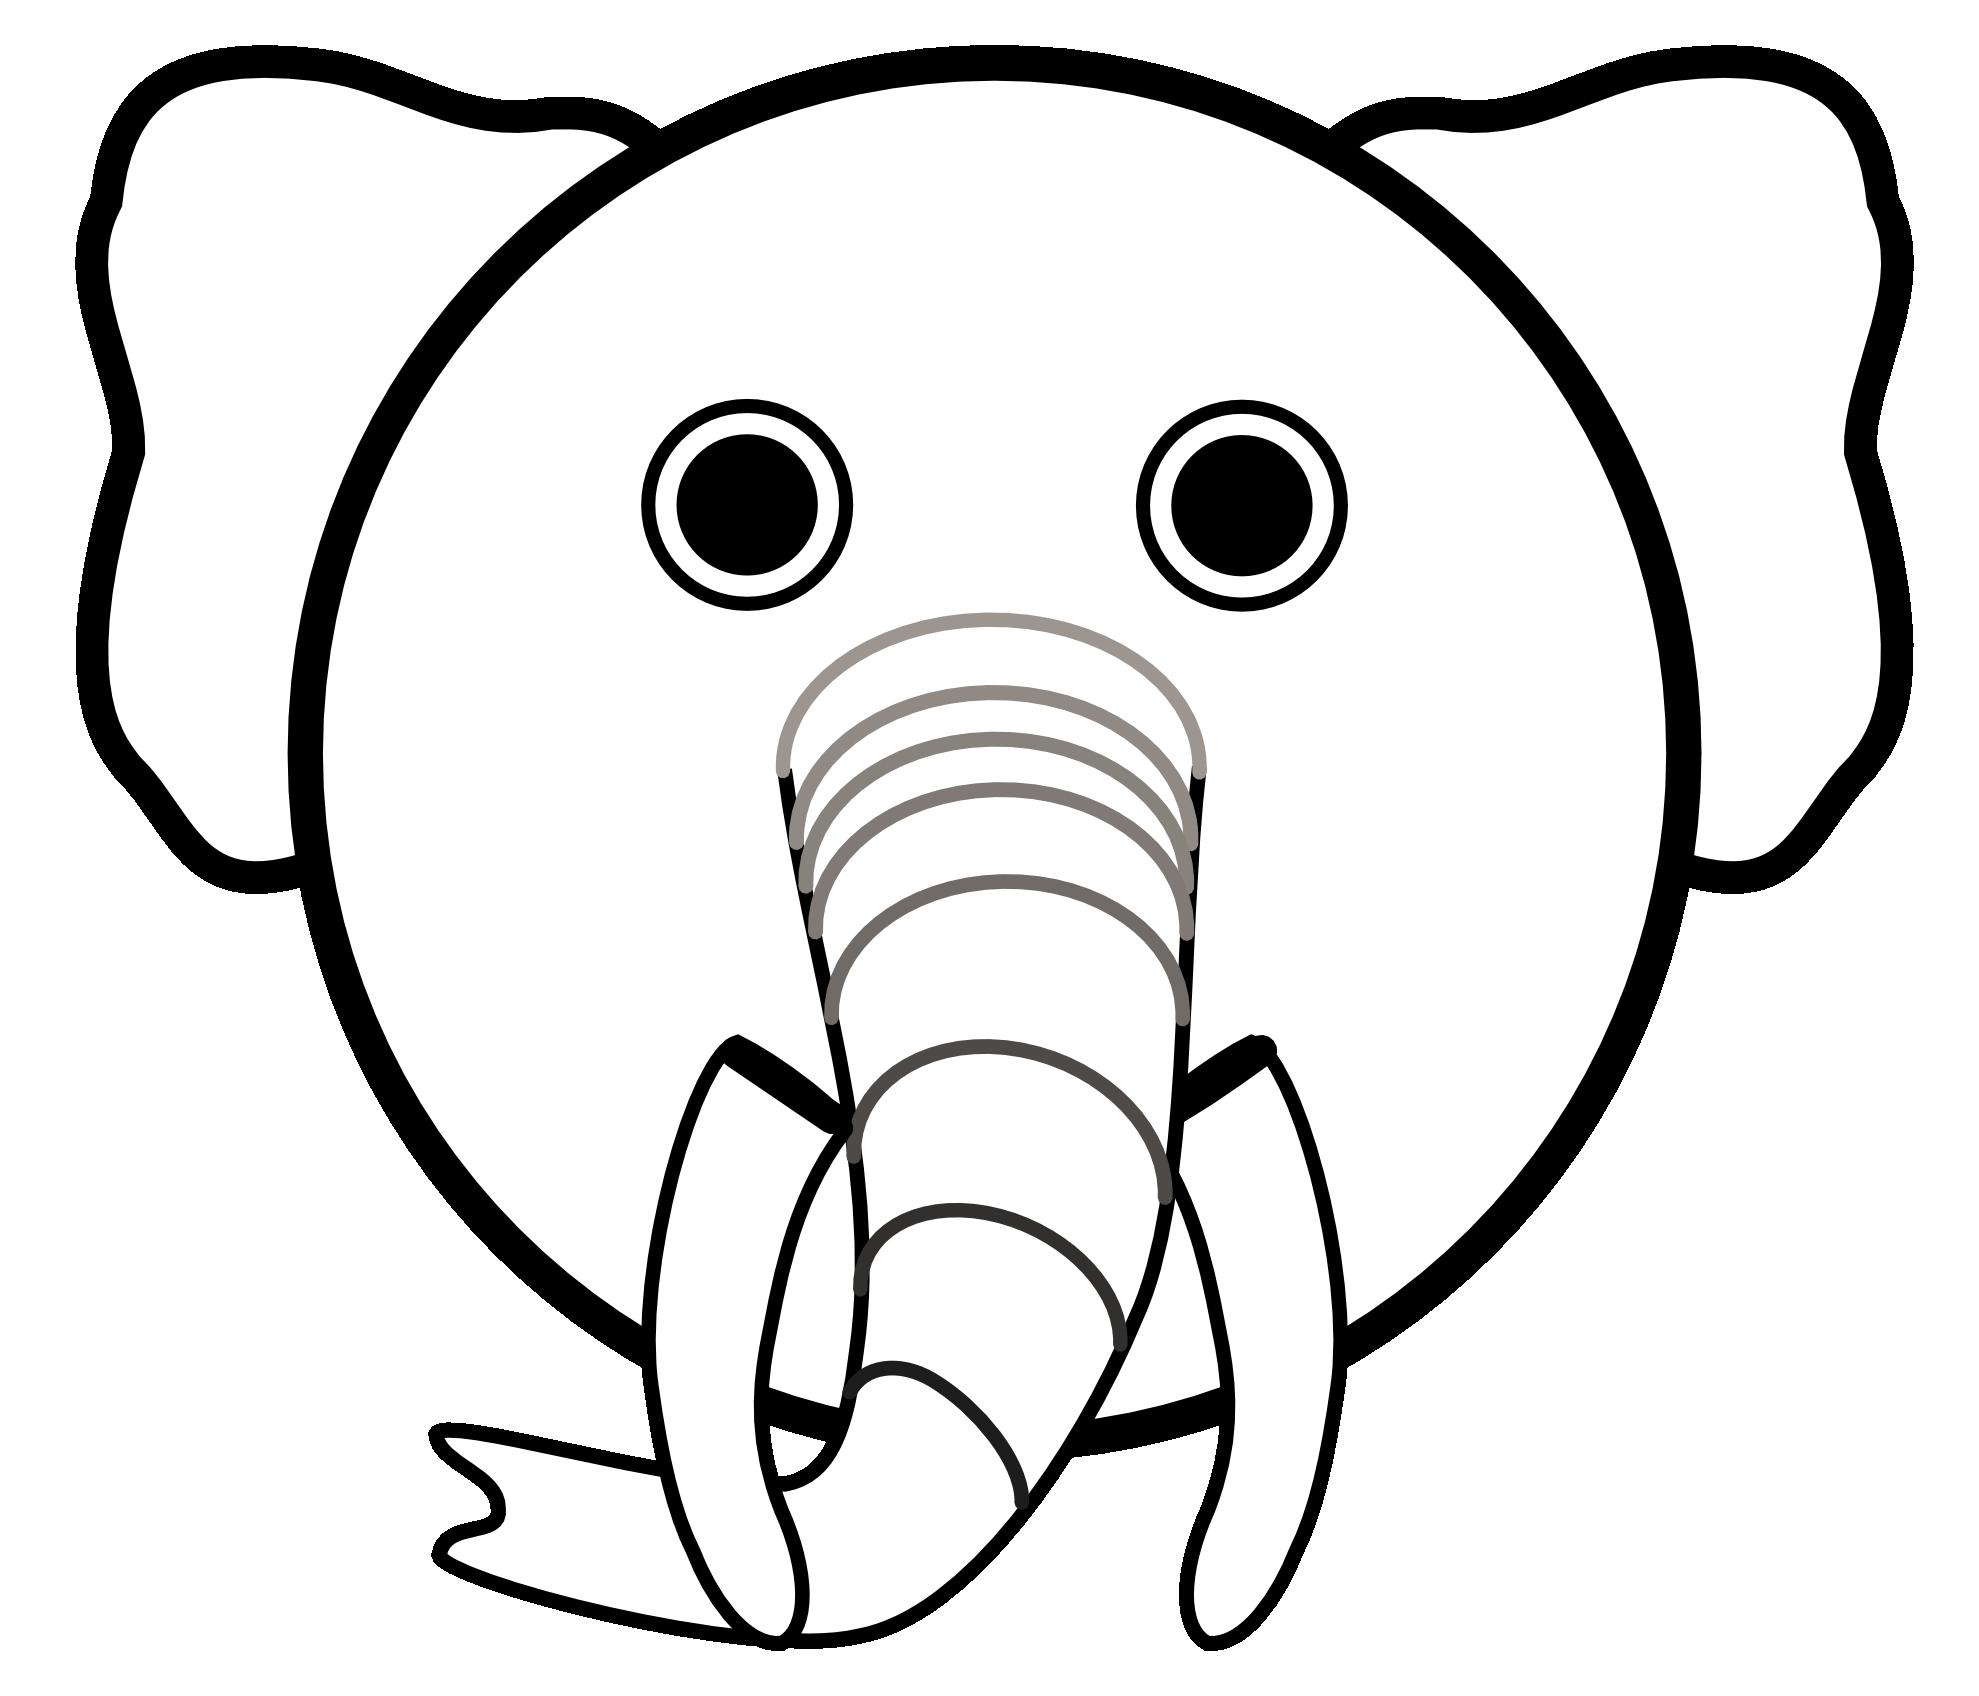 Christmas elephant clipart clipart free library Cute Elephant Clipart Black And White | Clipart Panda - Free Clipart ... clipart free library